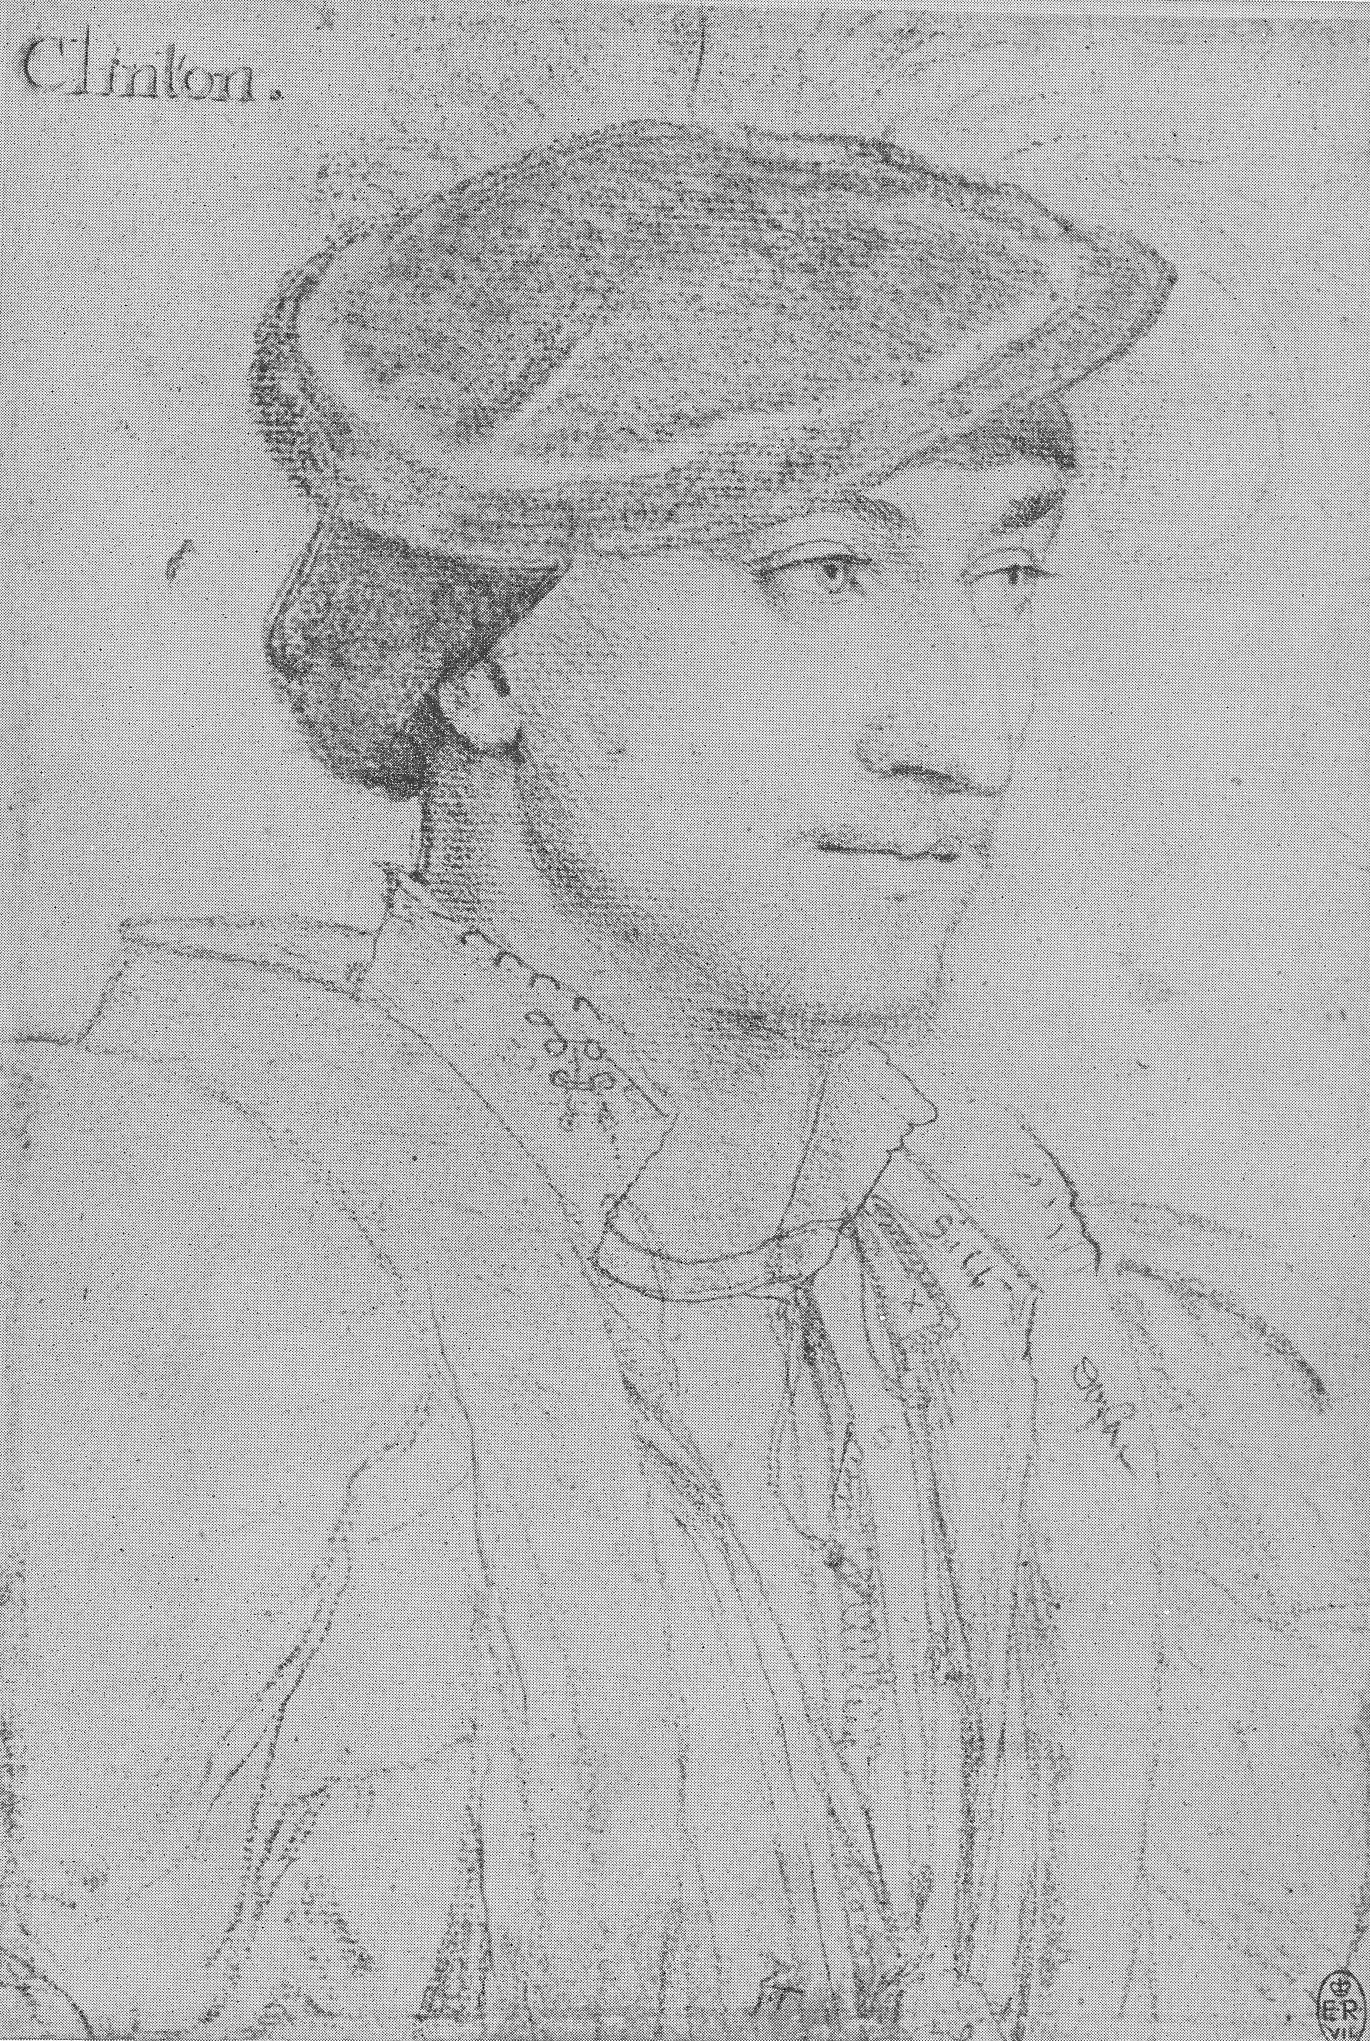 Portrait of Edward, Lord Clinton. c.1534-35